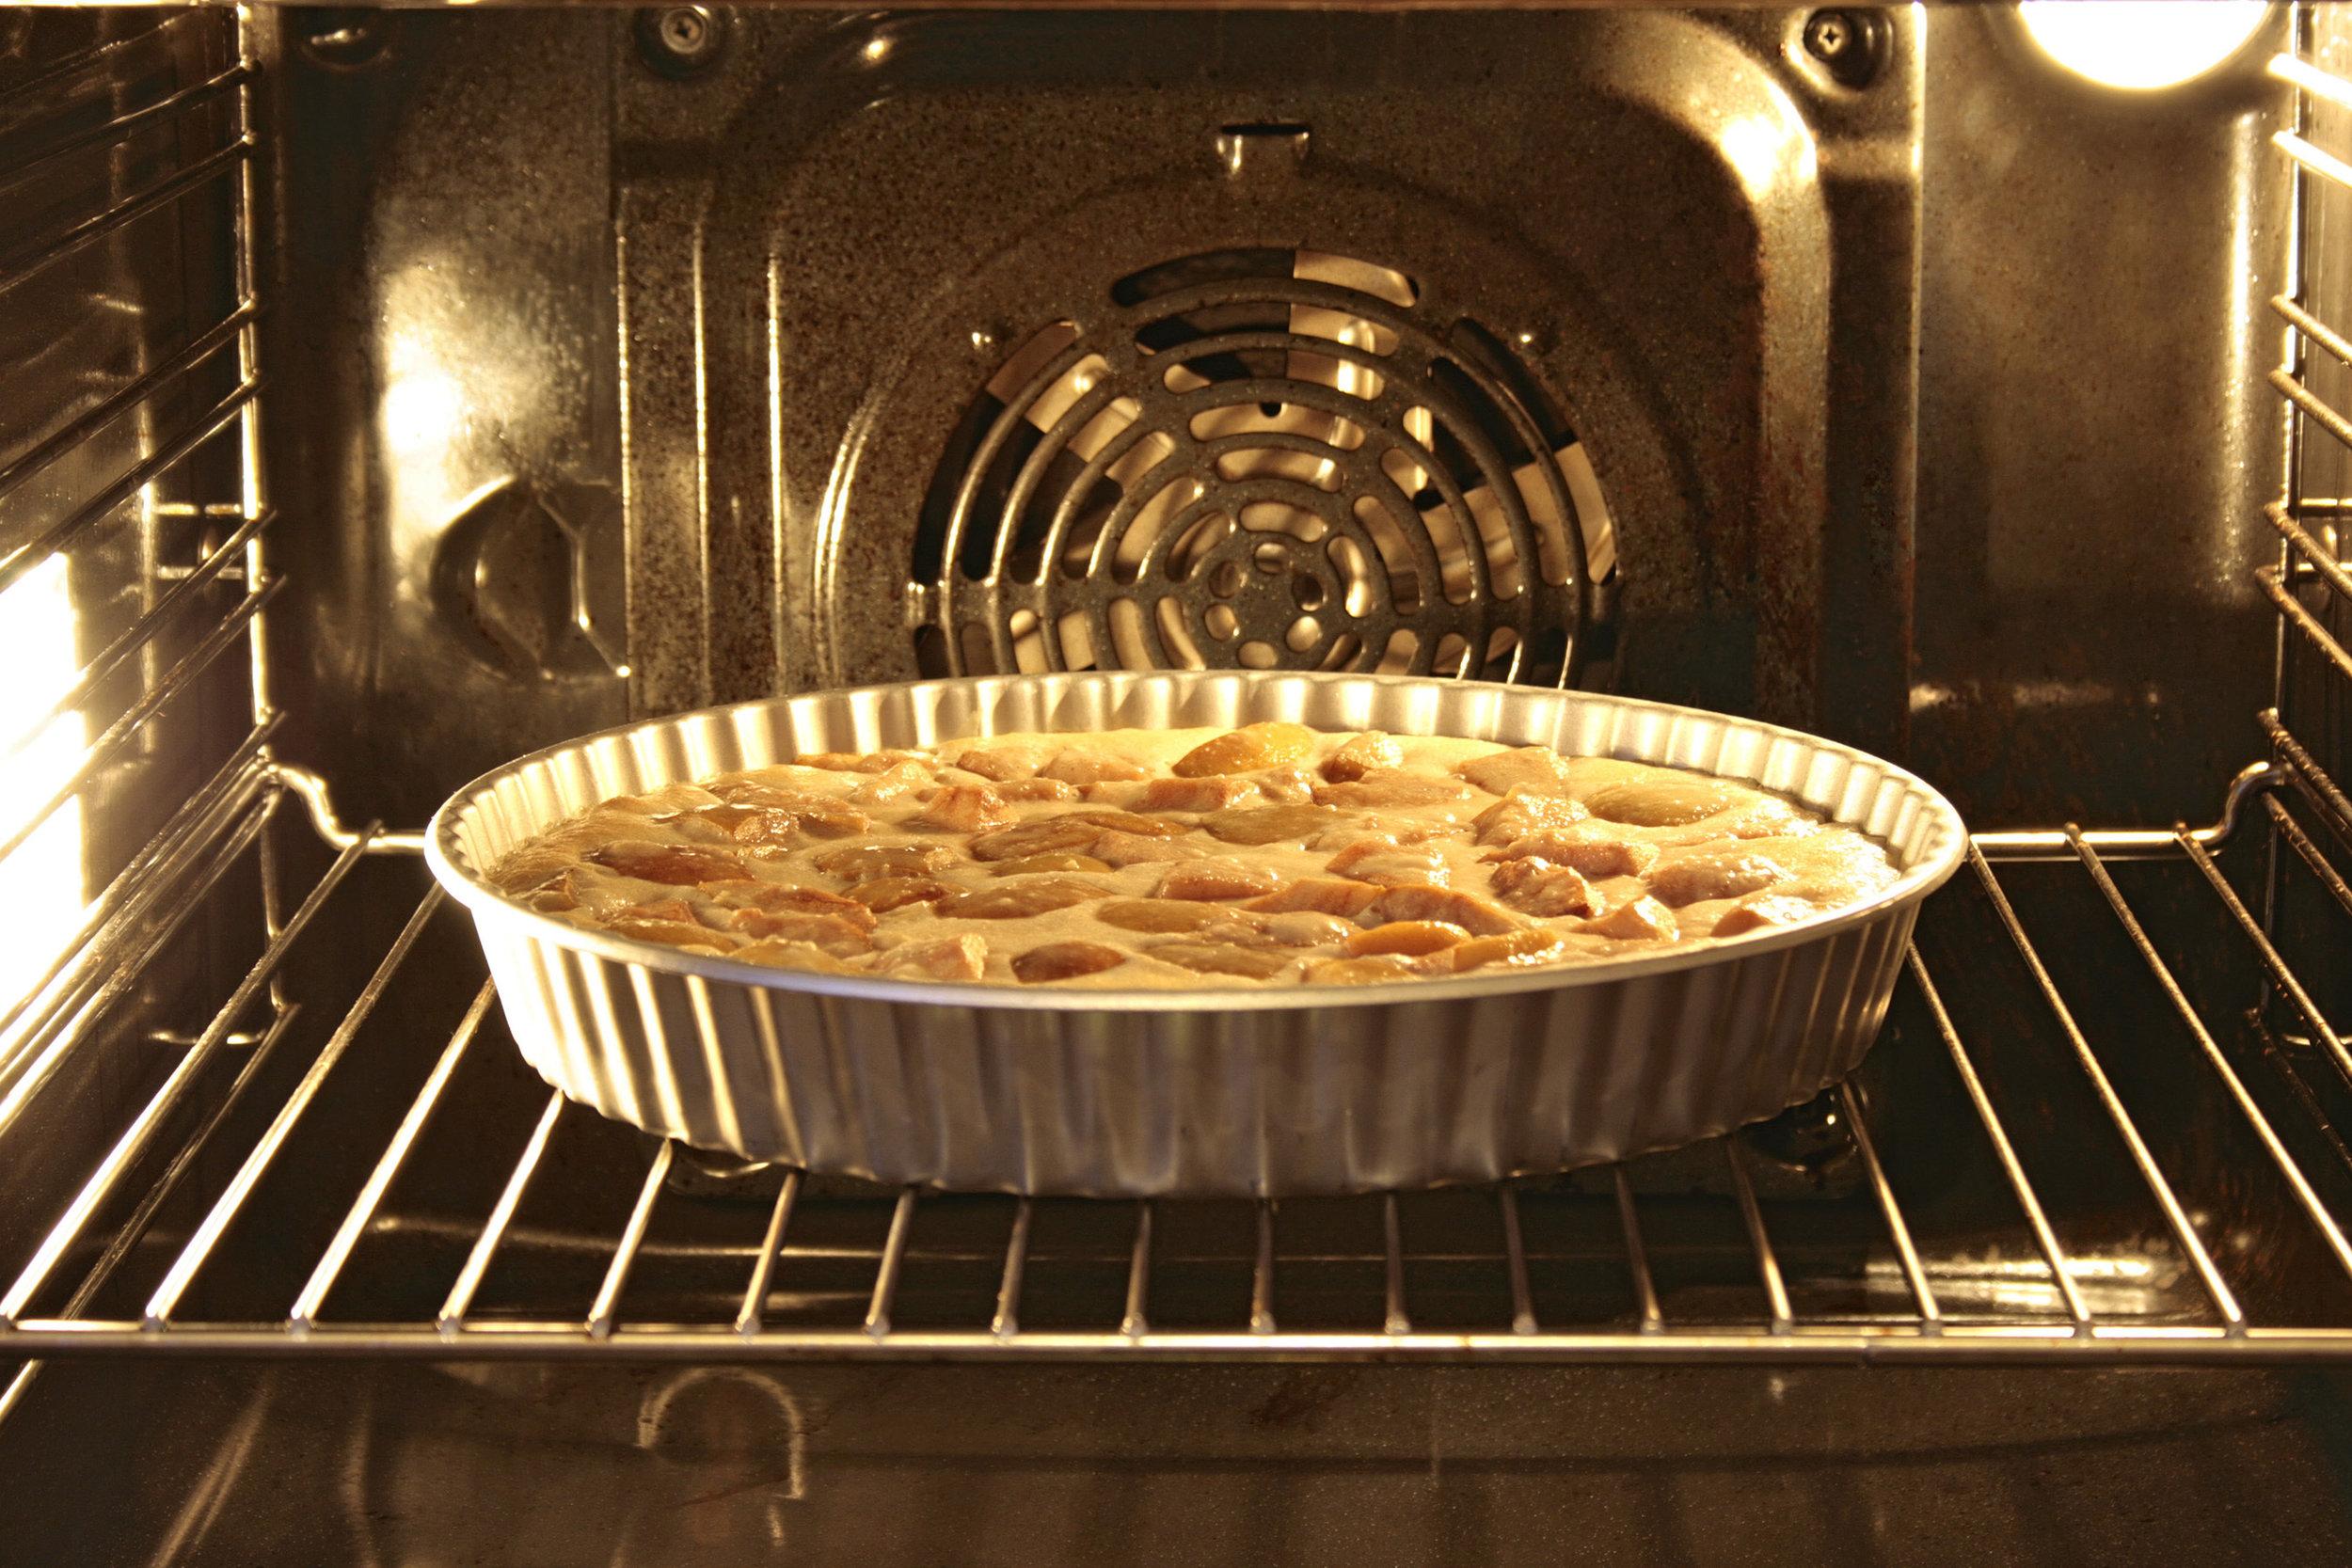 stock-photo-apple-pie-in-an-oven-30719215.jpg